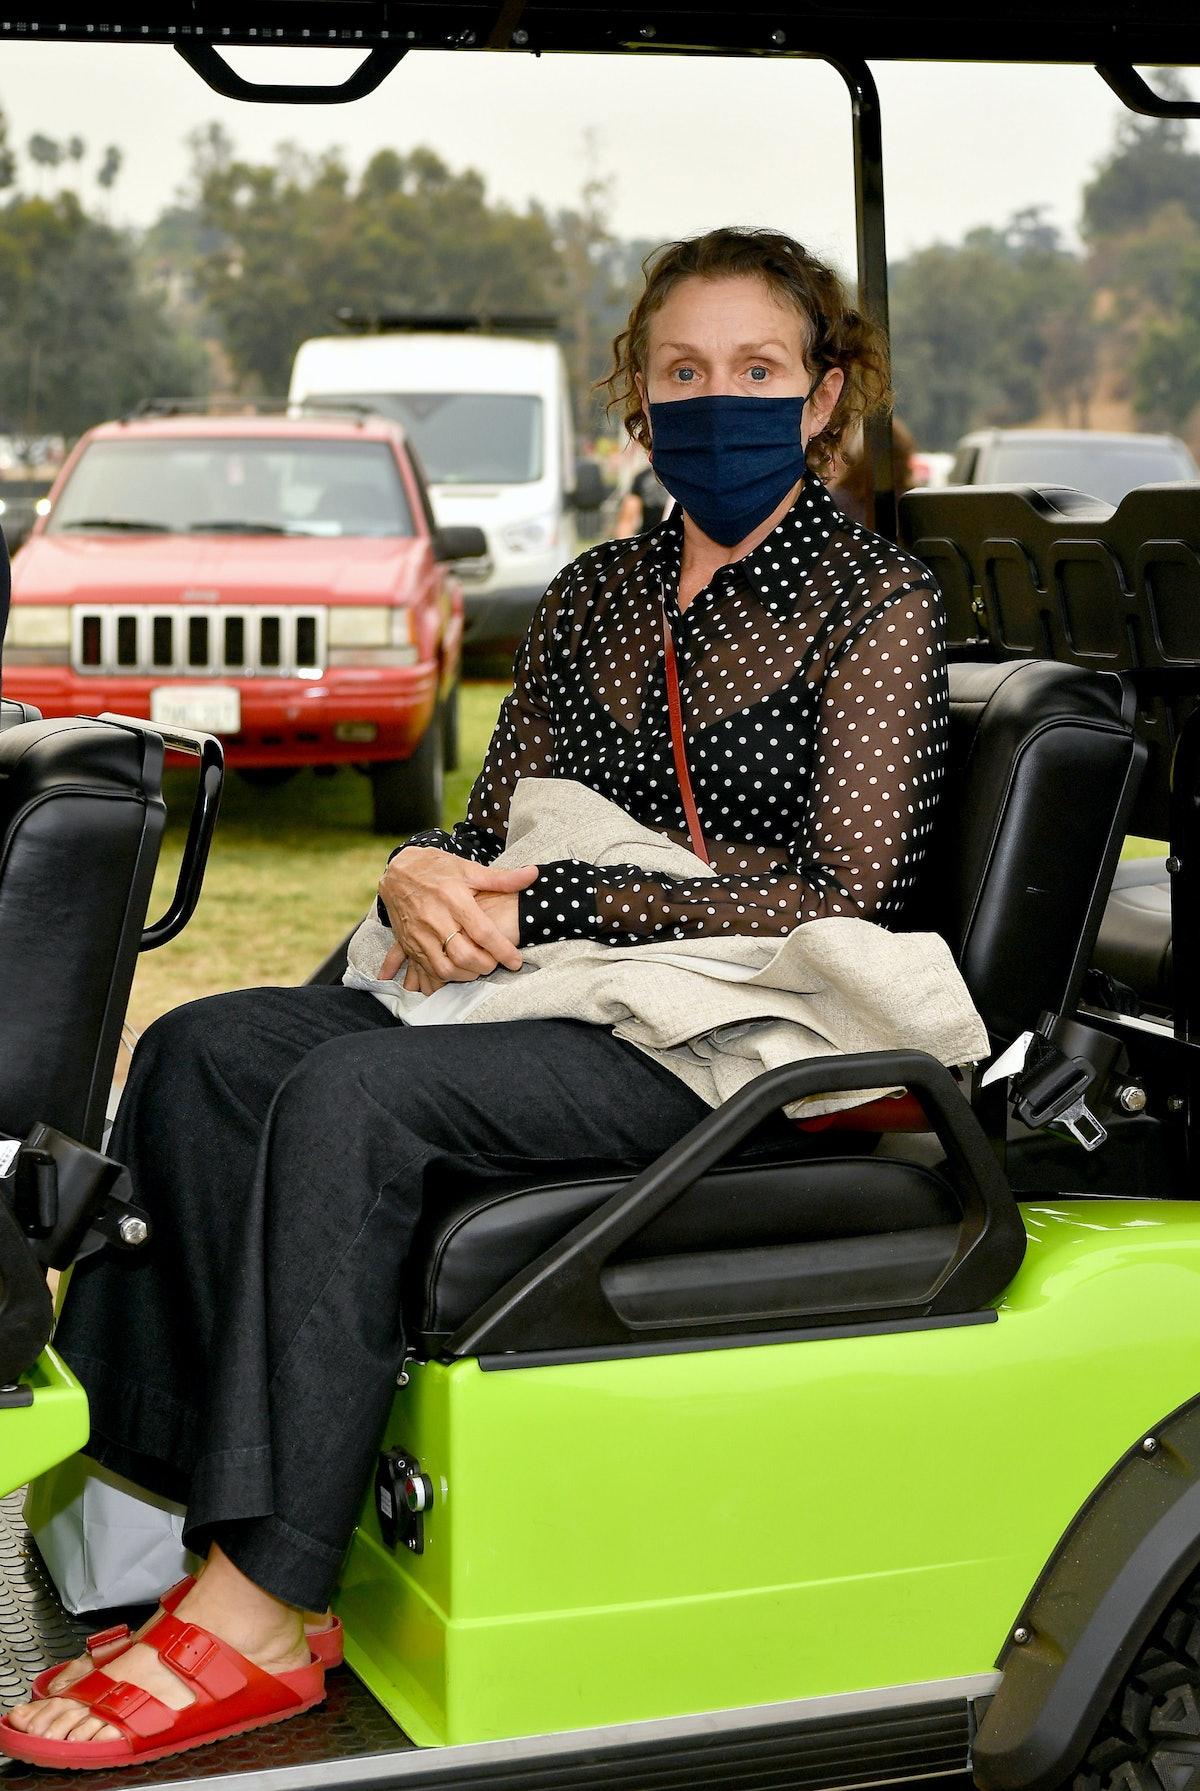 Frances McDormand on a tractor